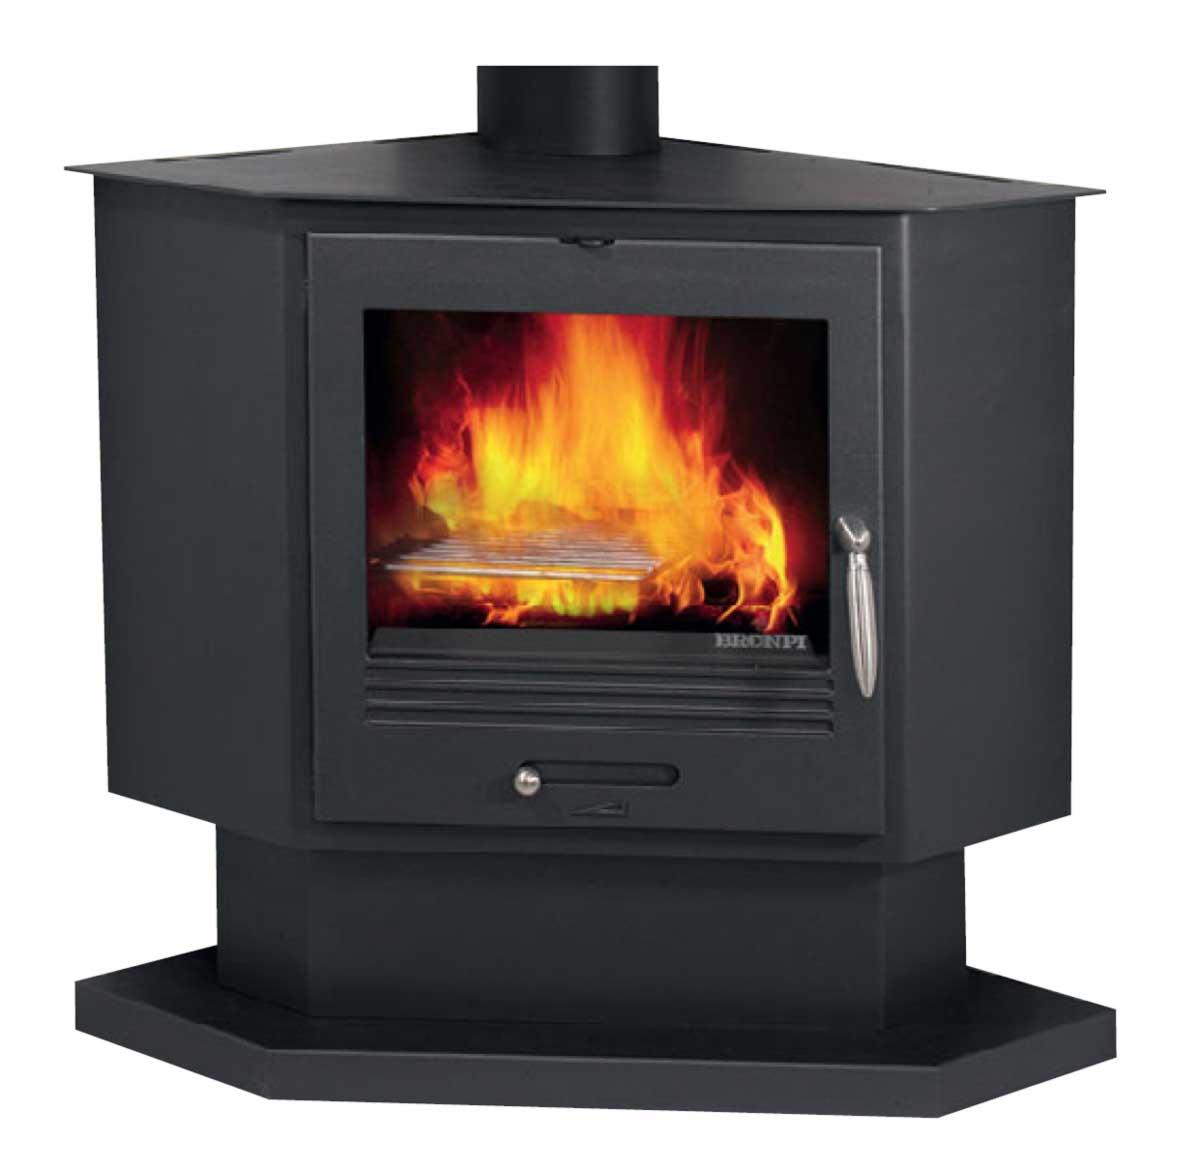 catalogue 2018 chauffage po le bois cadiz calid al. Black Bedroom Furniture Sets. Home Design Ideas